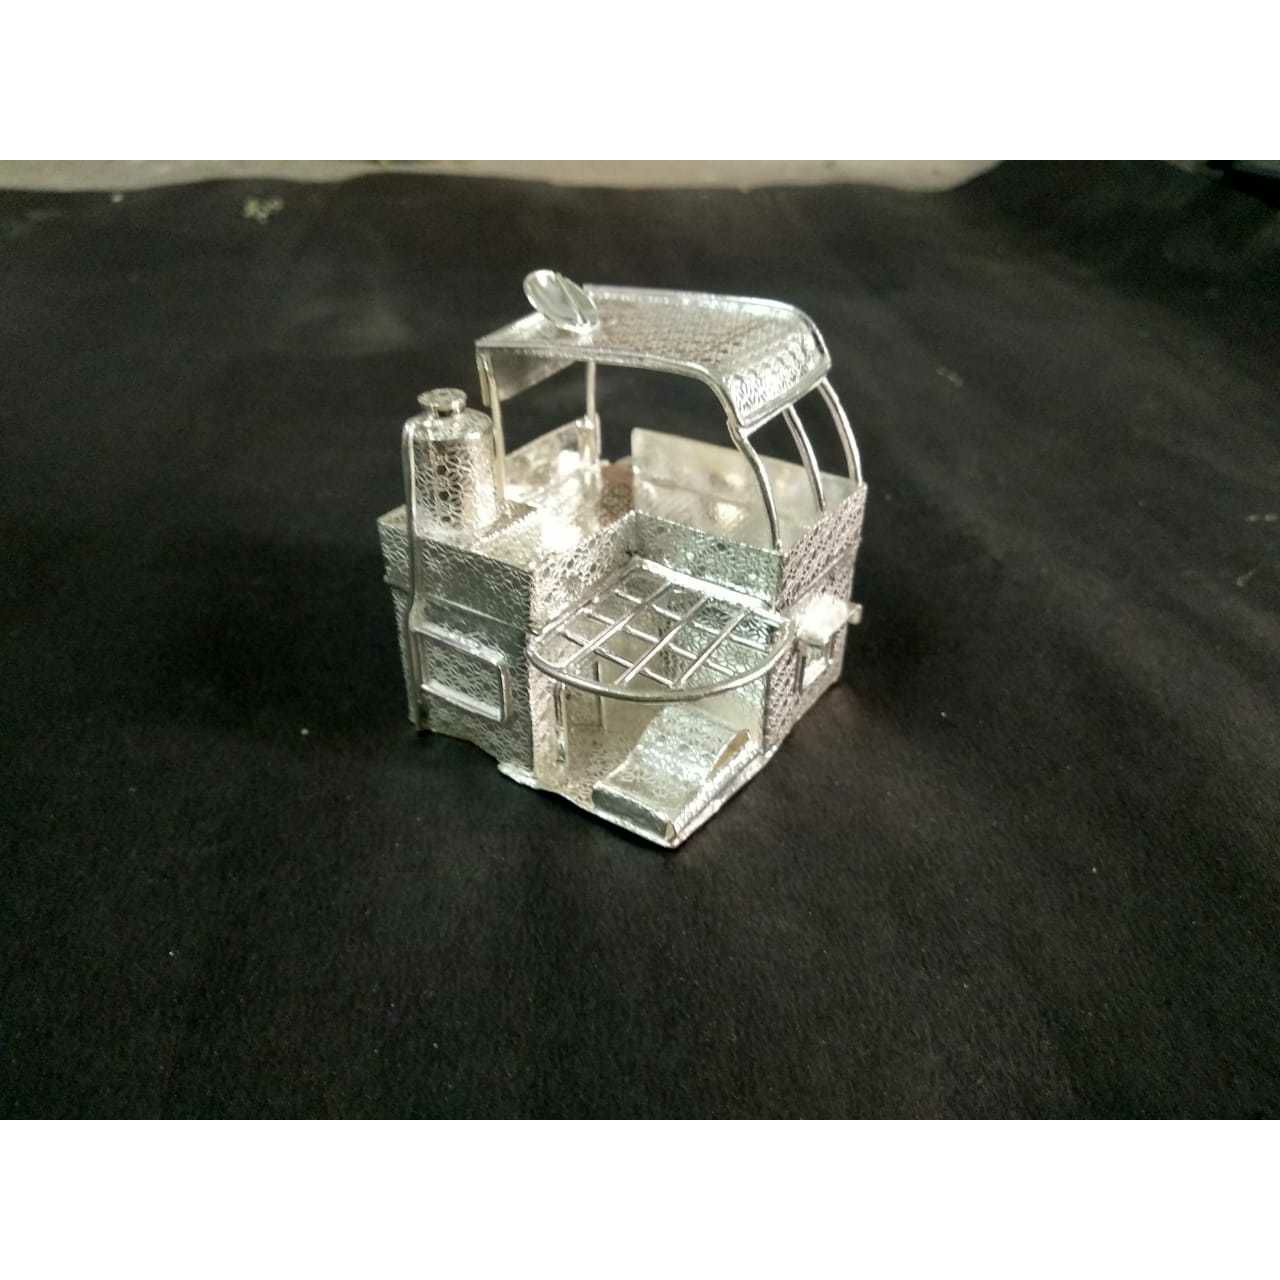 Silver Antique Iteam Ms-1580